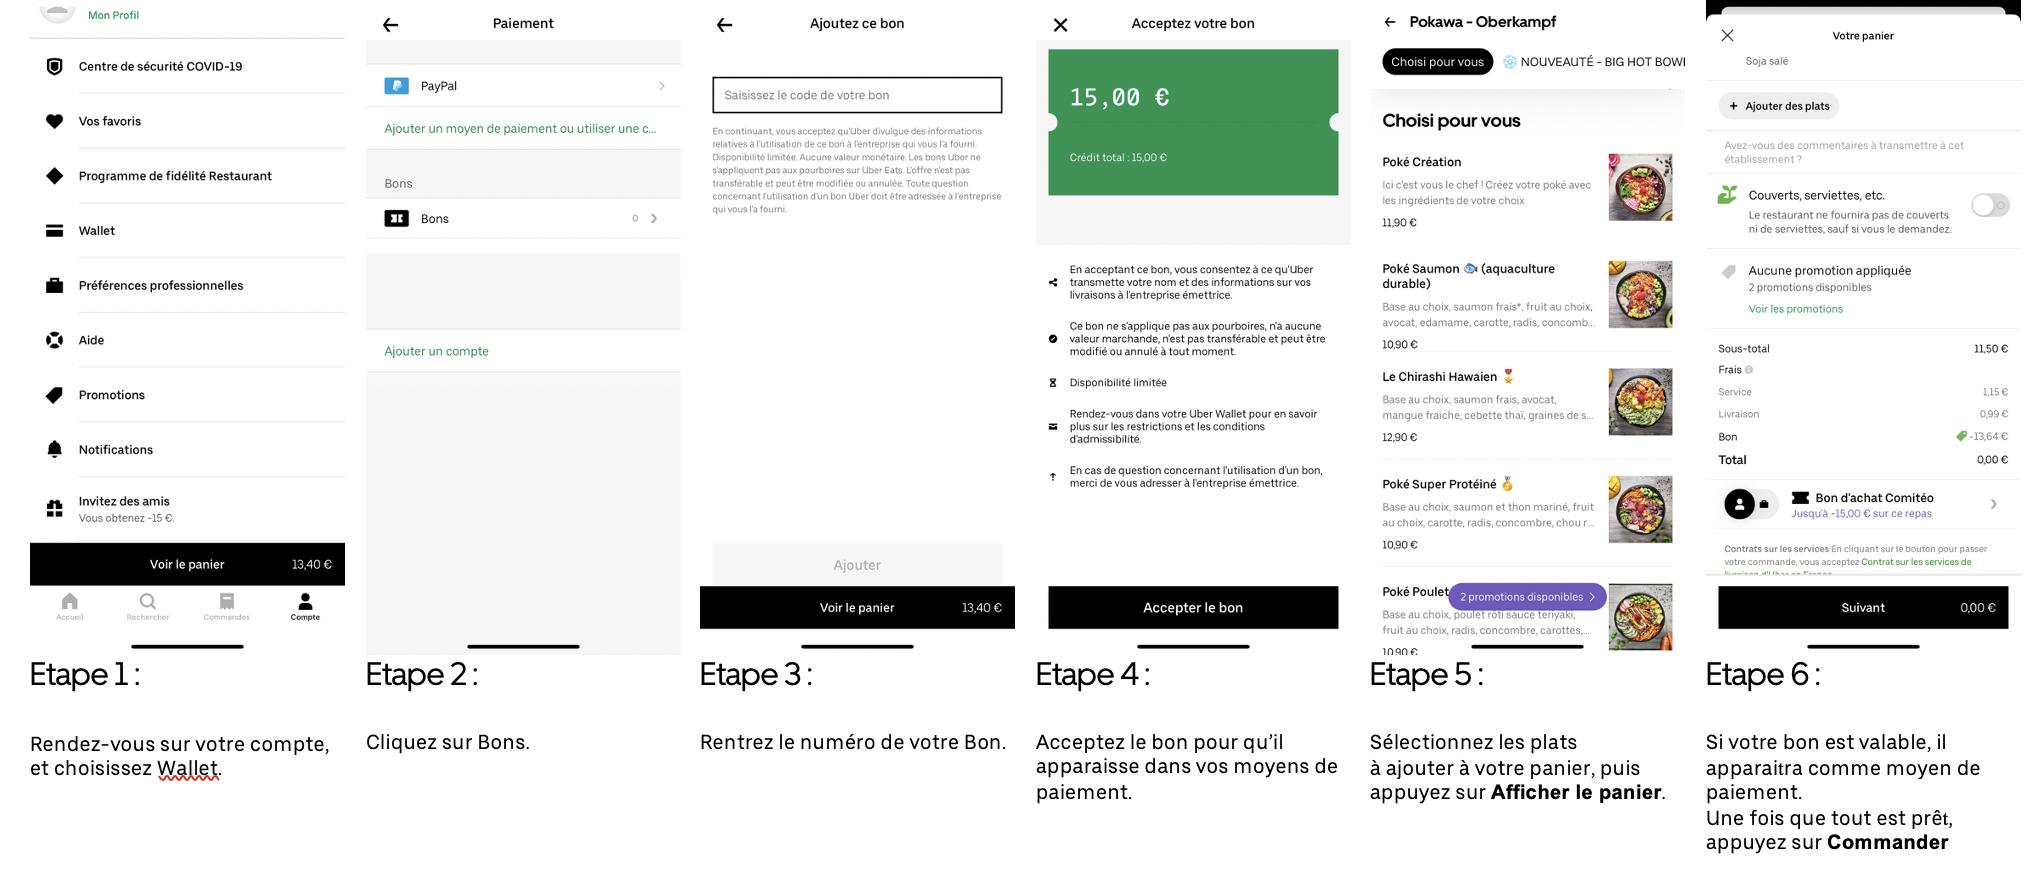 E-bon d'achat de 30€ - Uber Eats